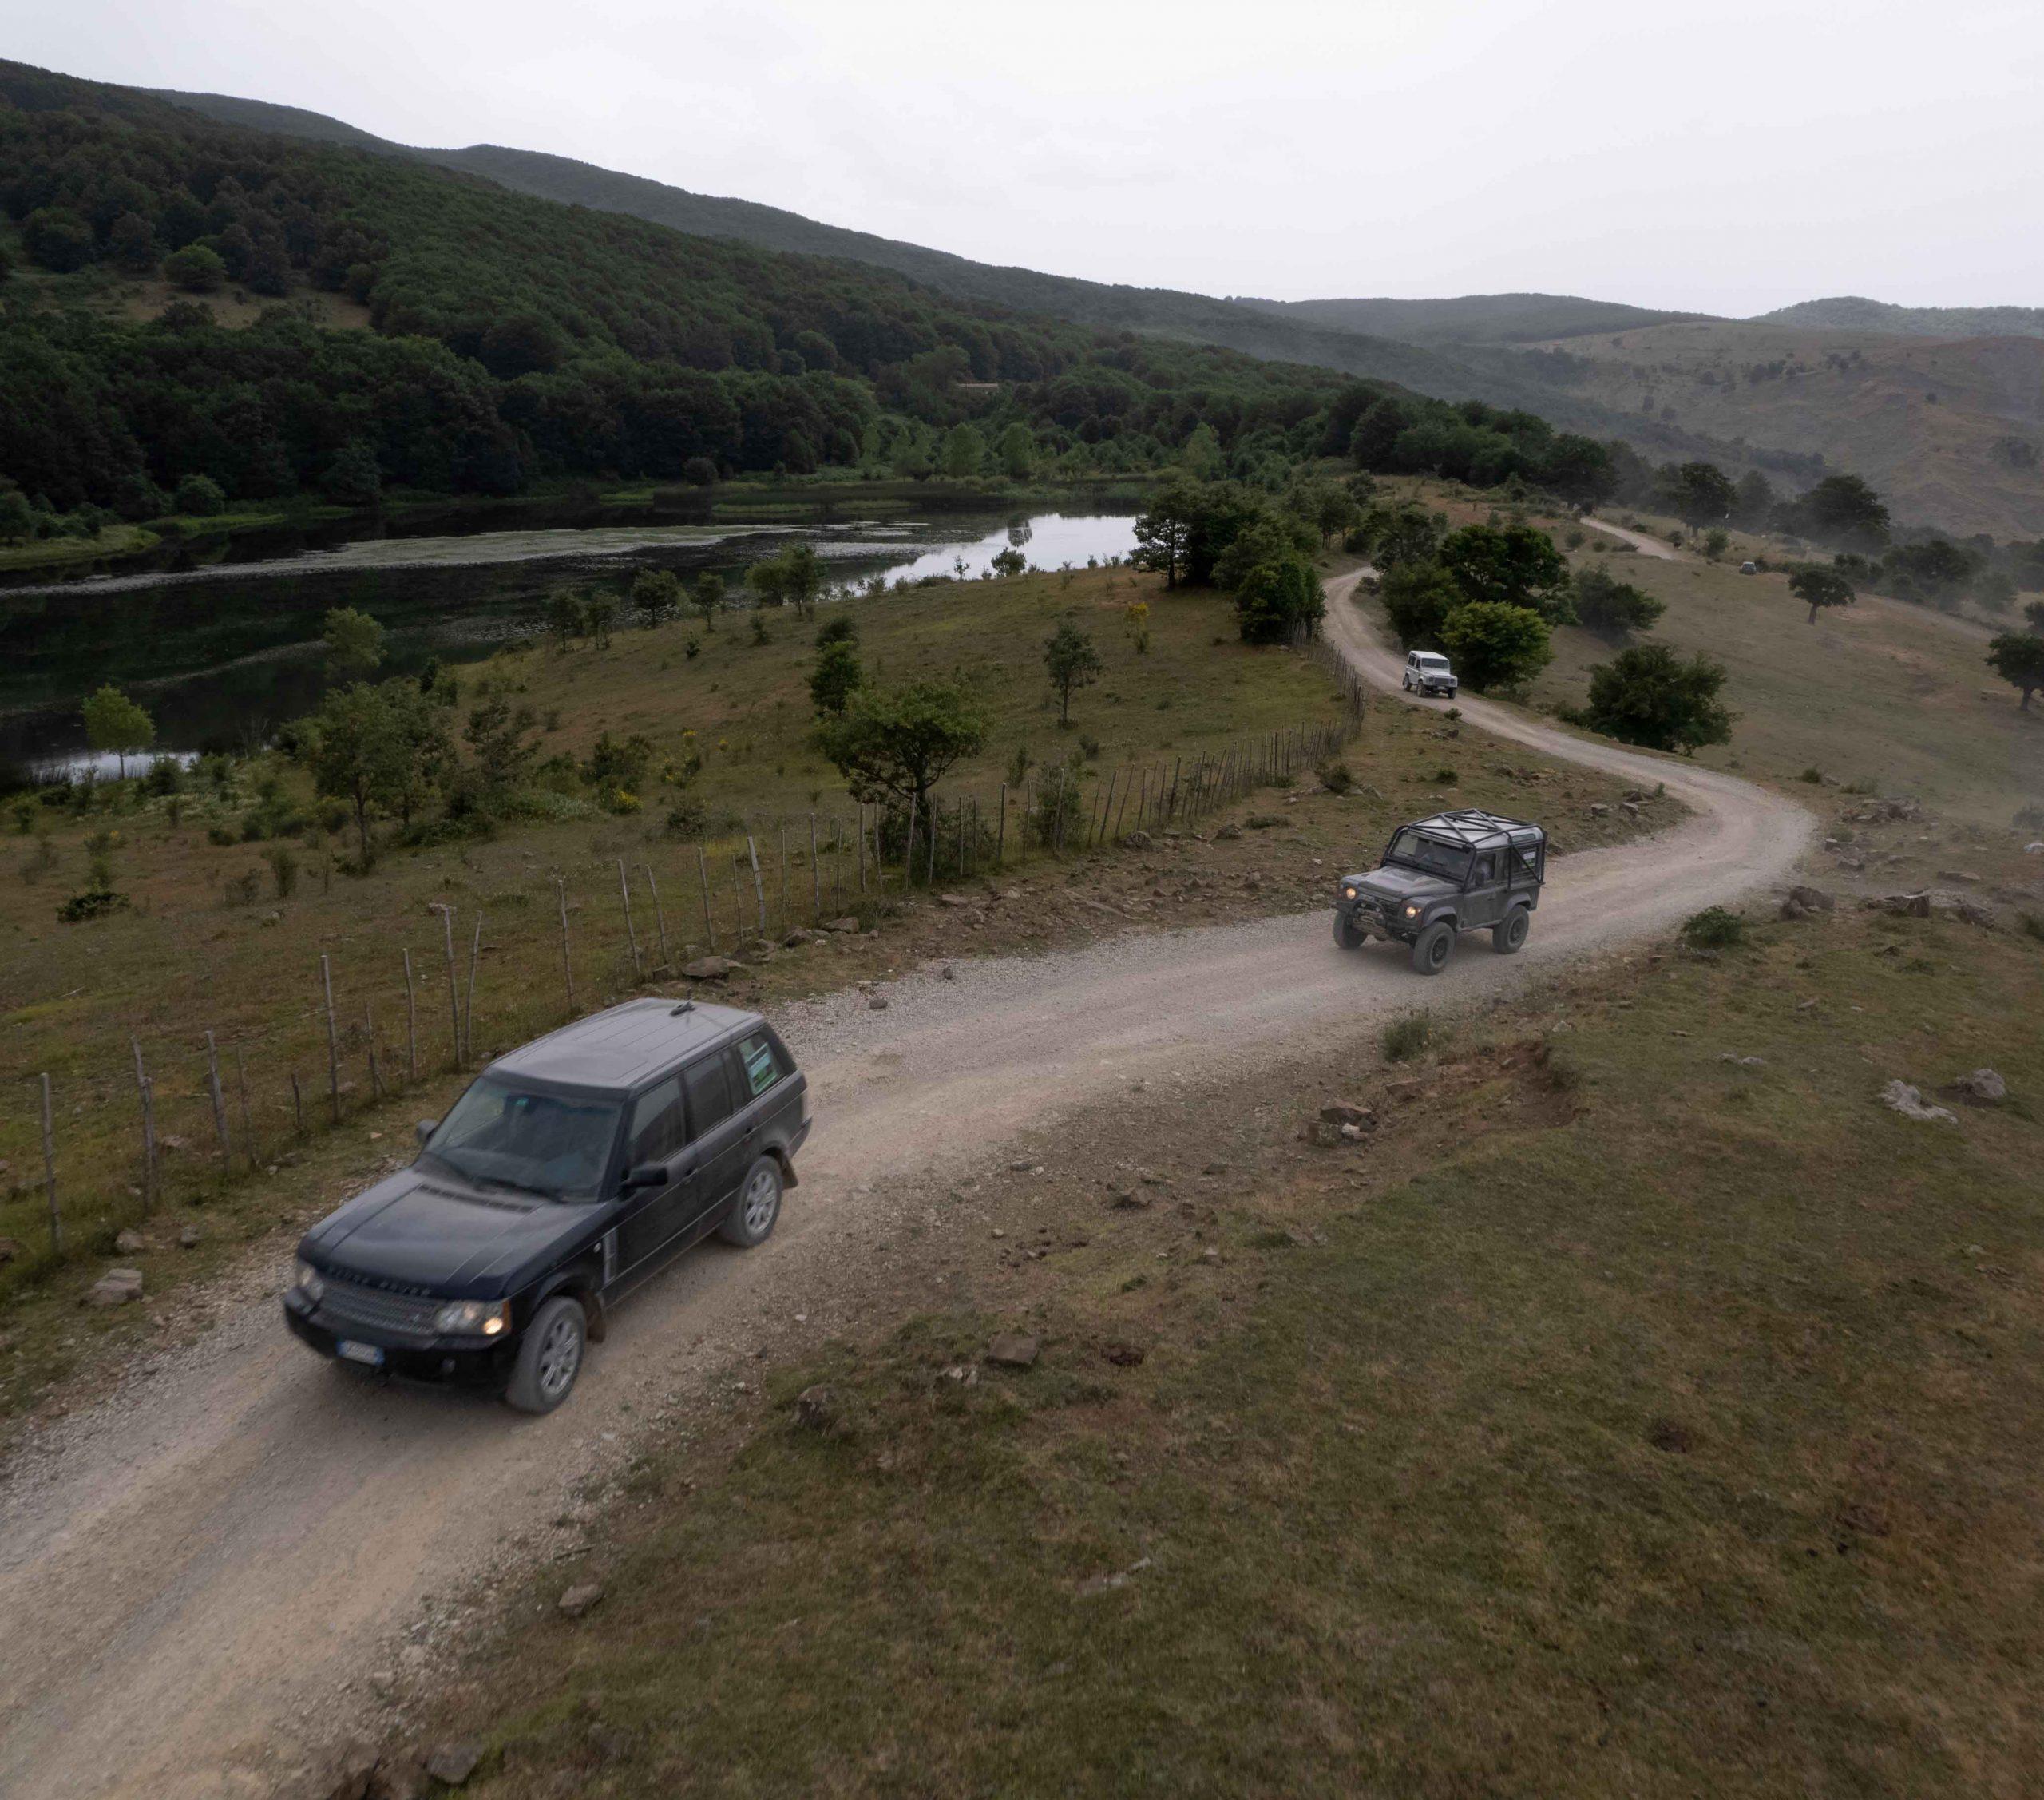 Land_Rover_Tour_Sicilia_2021_Land_Rover_Experience_Italia_-66